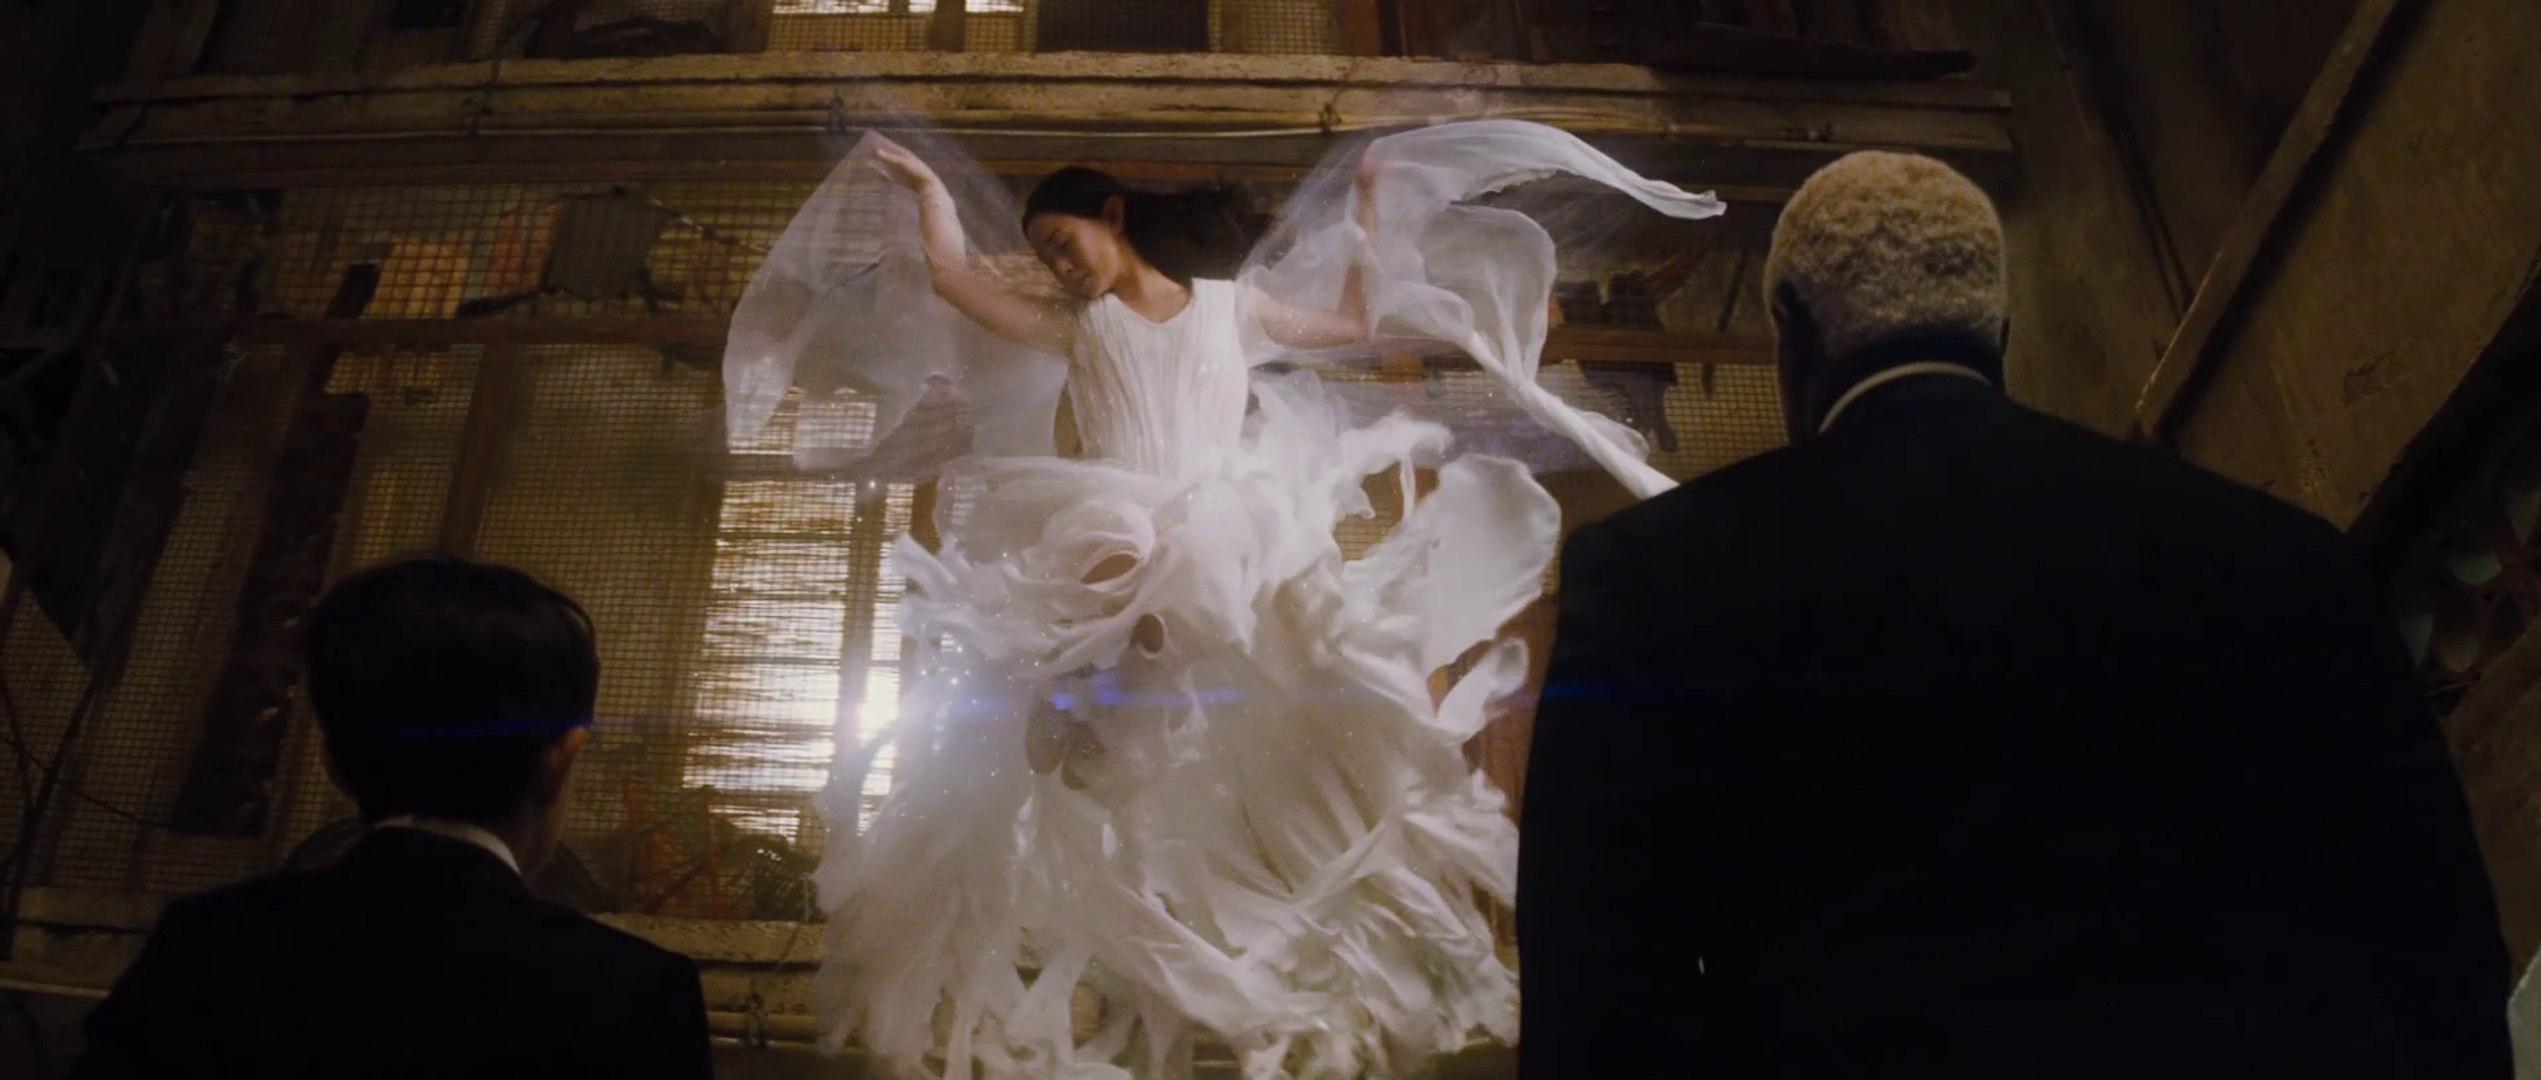 Artemis Fowl (2019) - Trailer